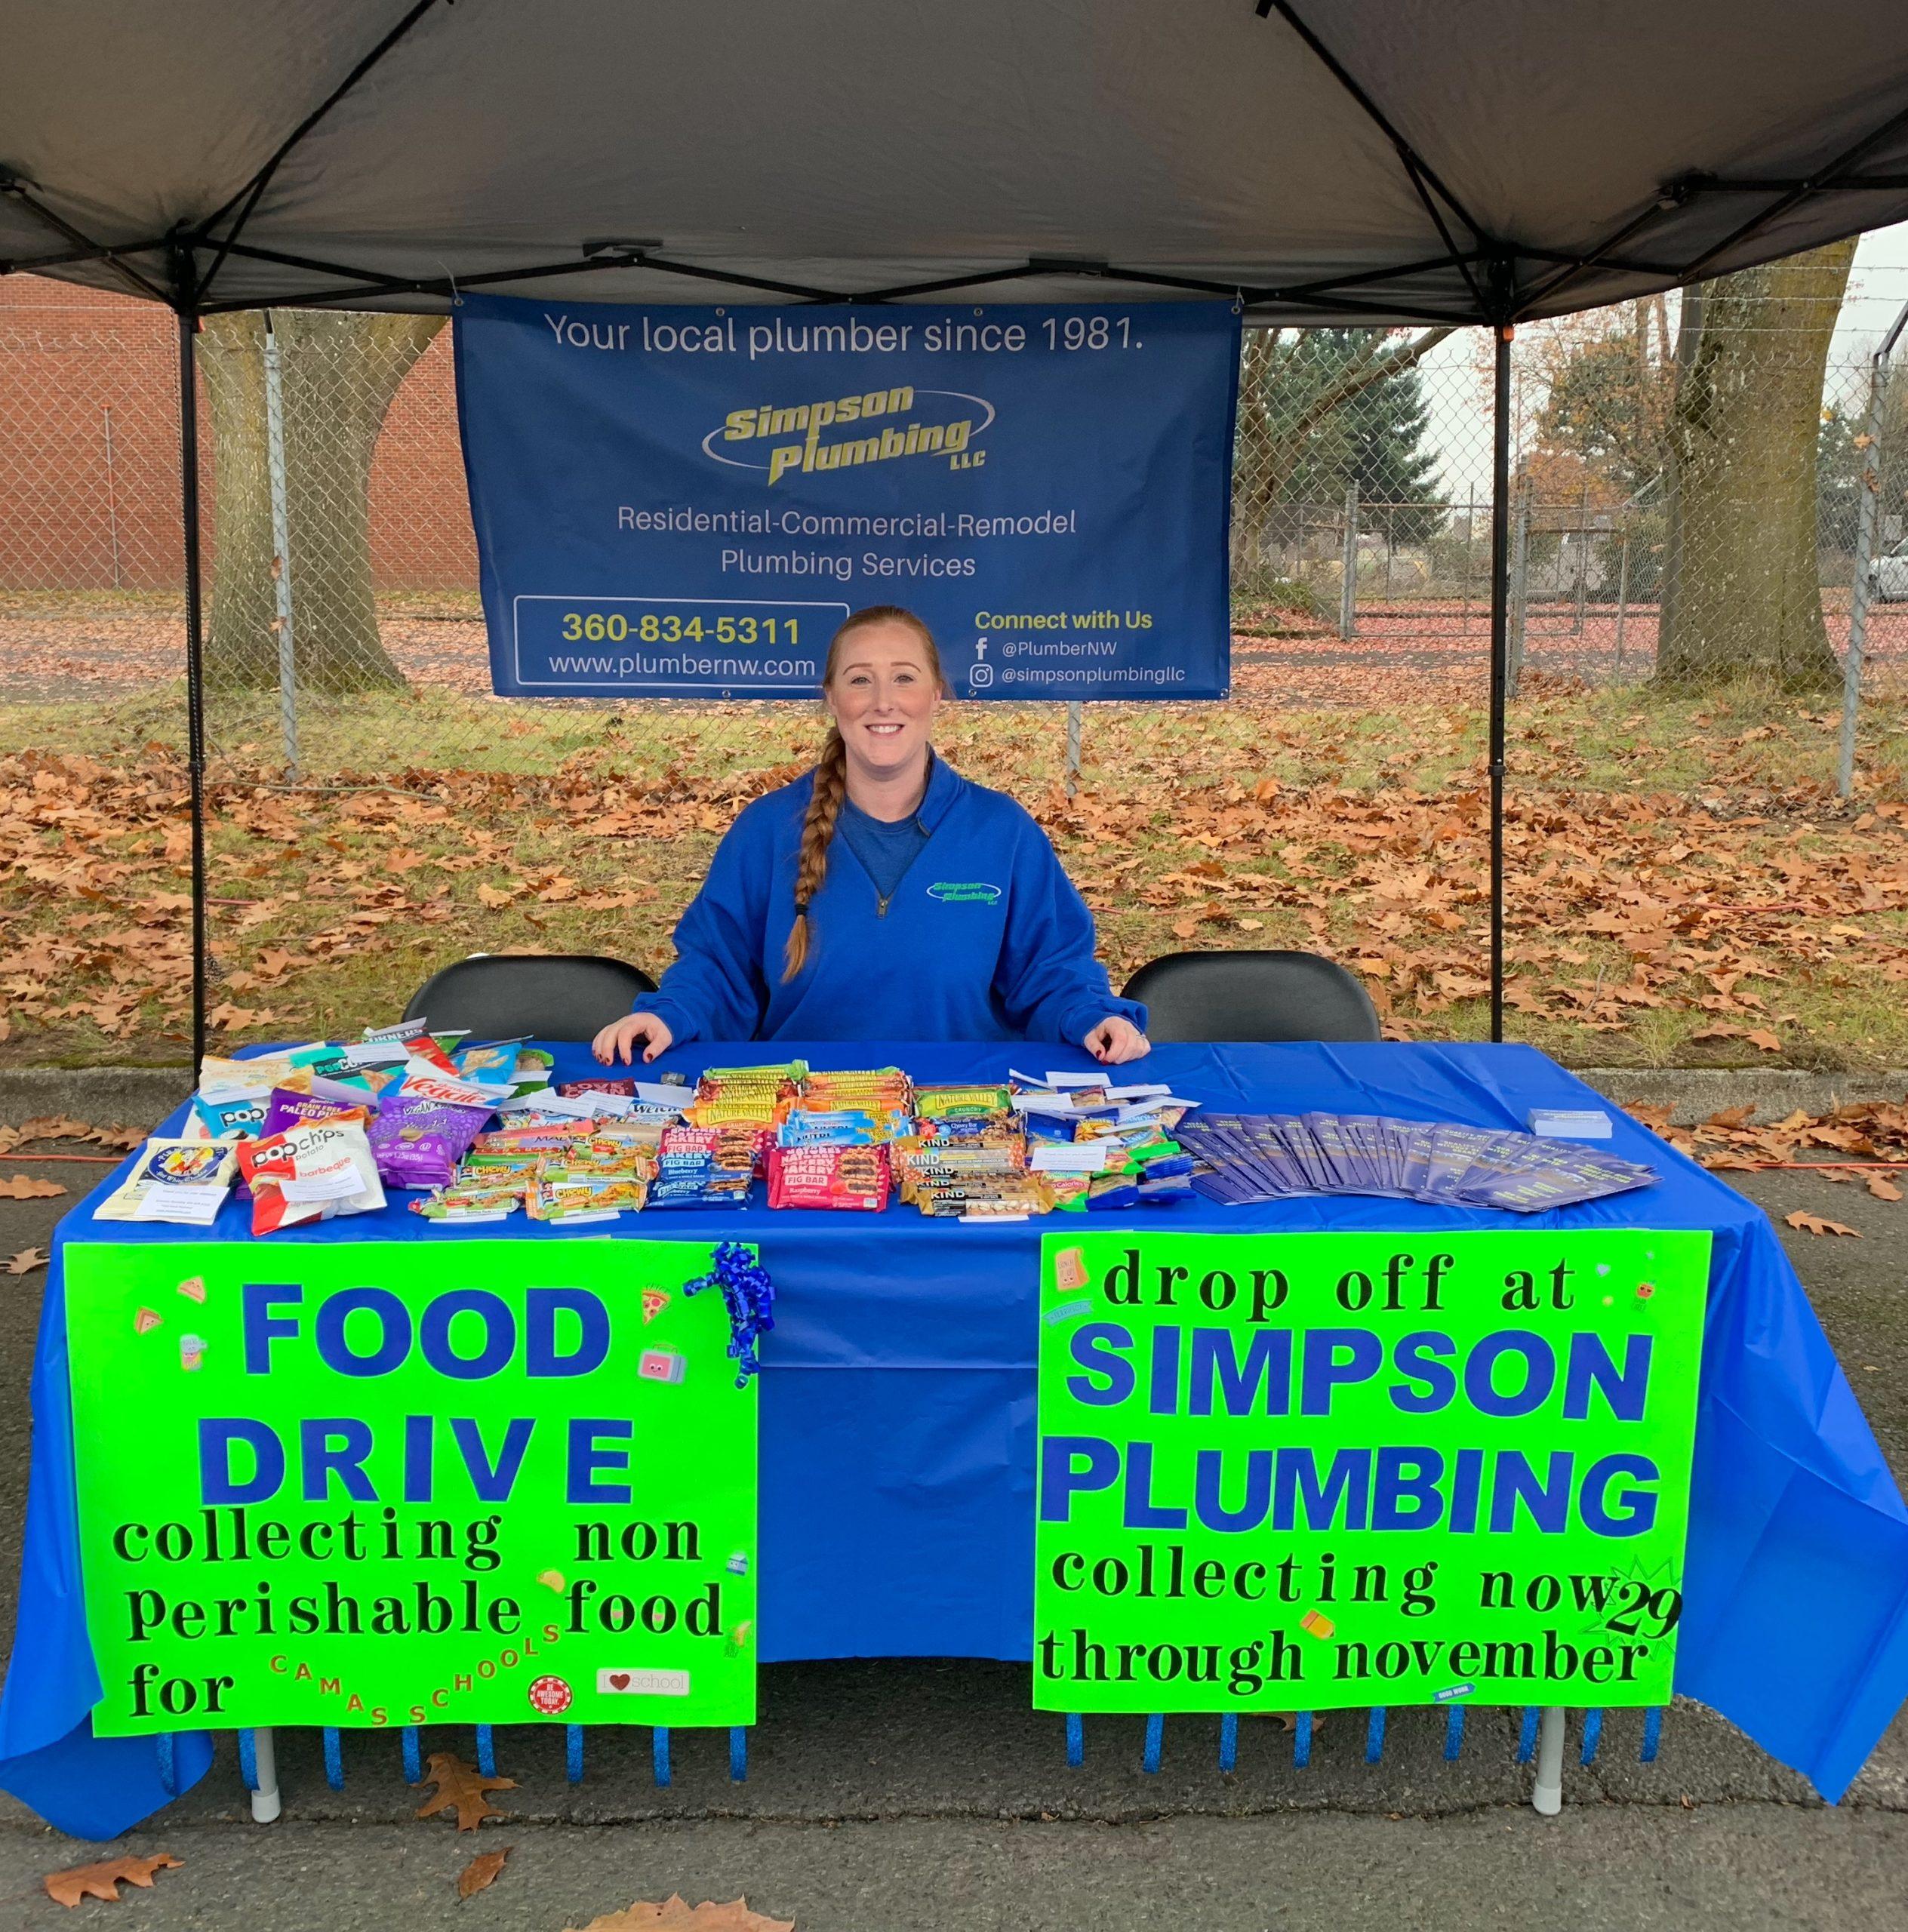 Simpson Plumbing Employees Volunteering